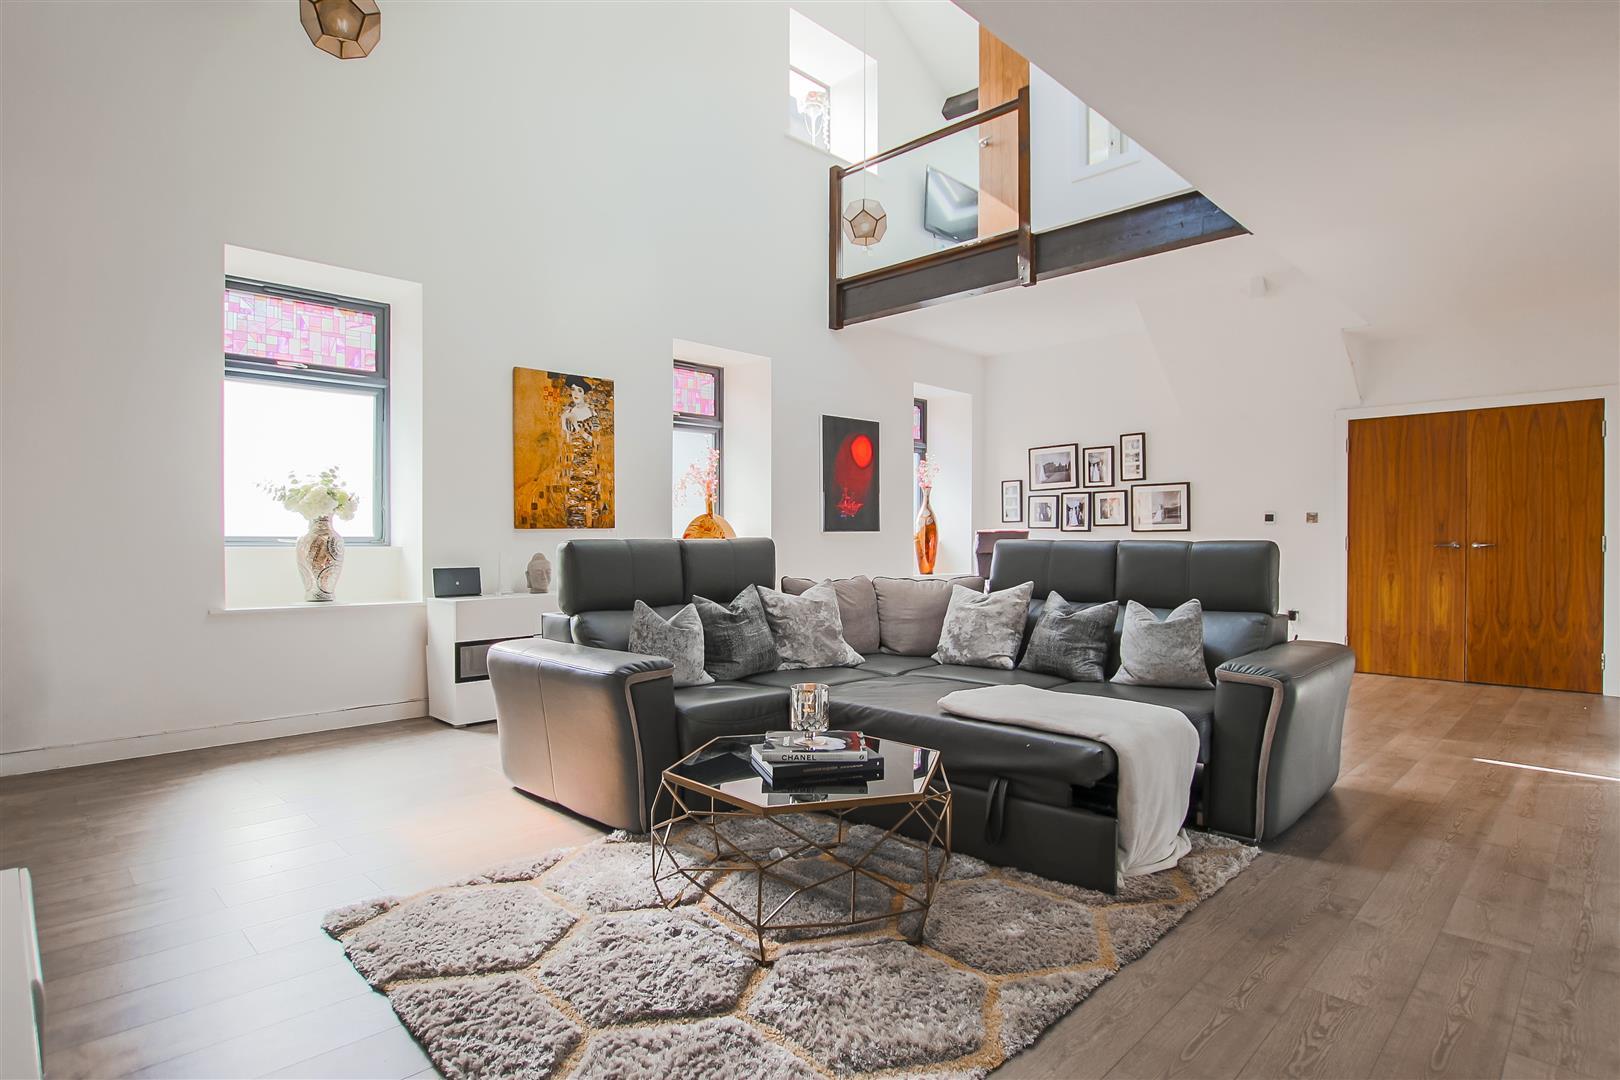 3 Bedroom Duplex Apartment For Sale - Image 22